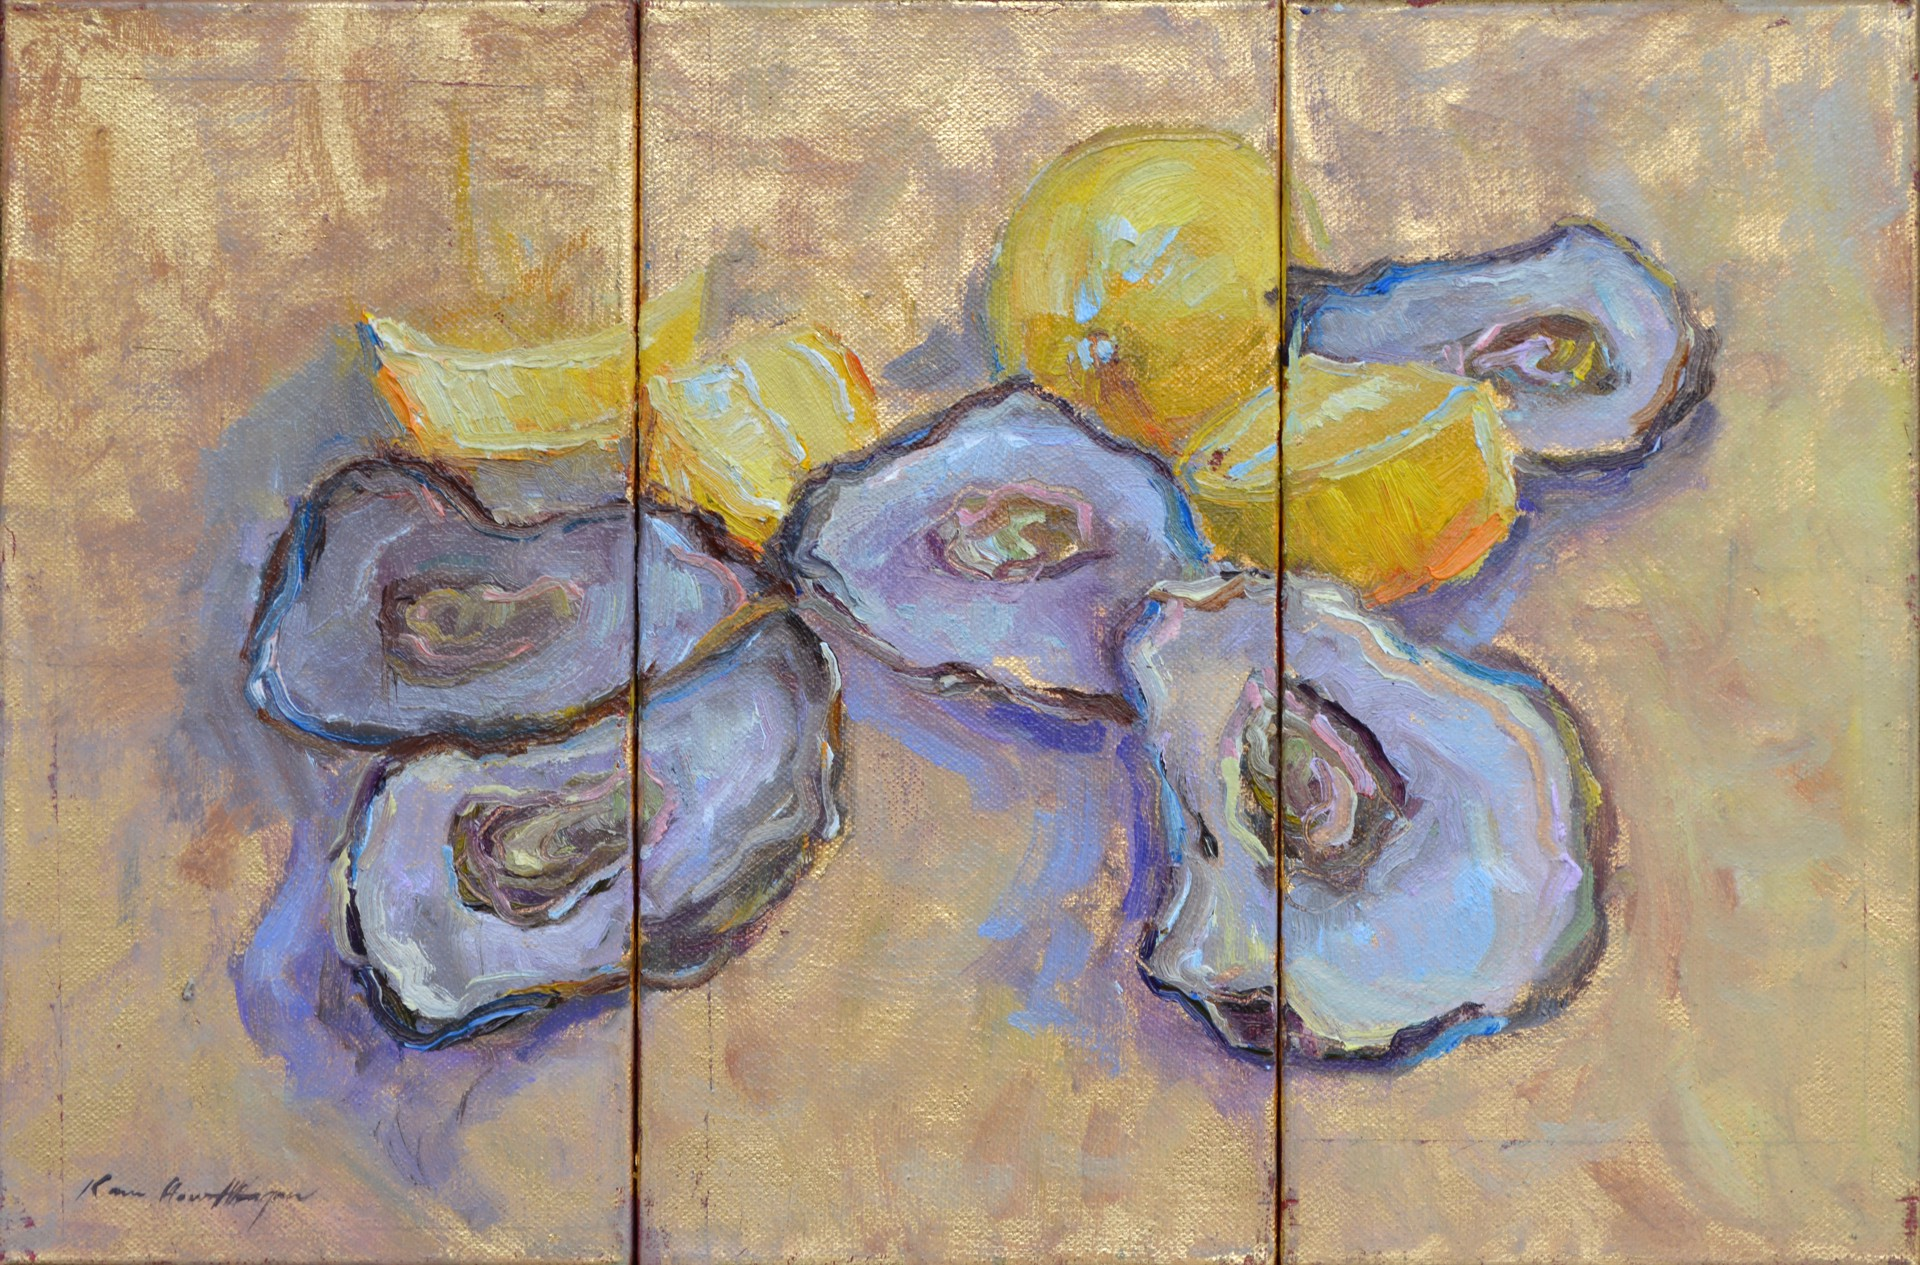 Oysters on Gold 1,2,&3 (Triptych) by Karen Hewitt Hagan